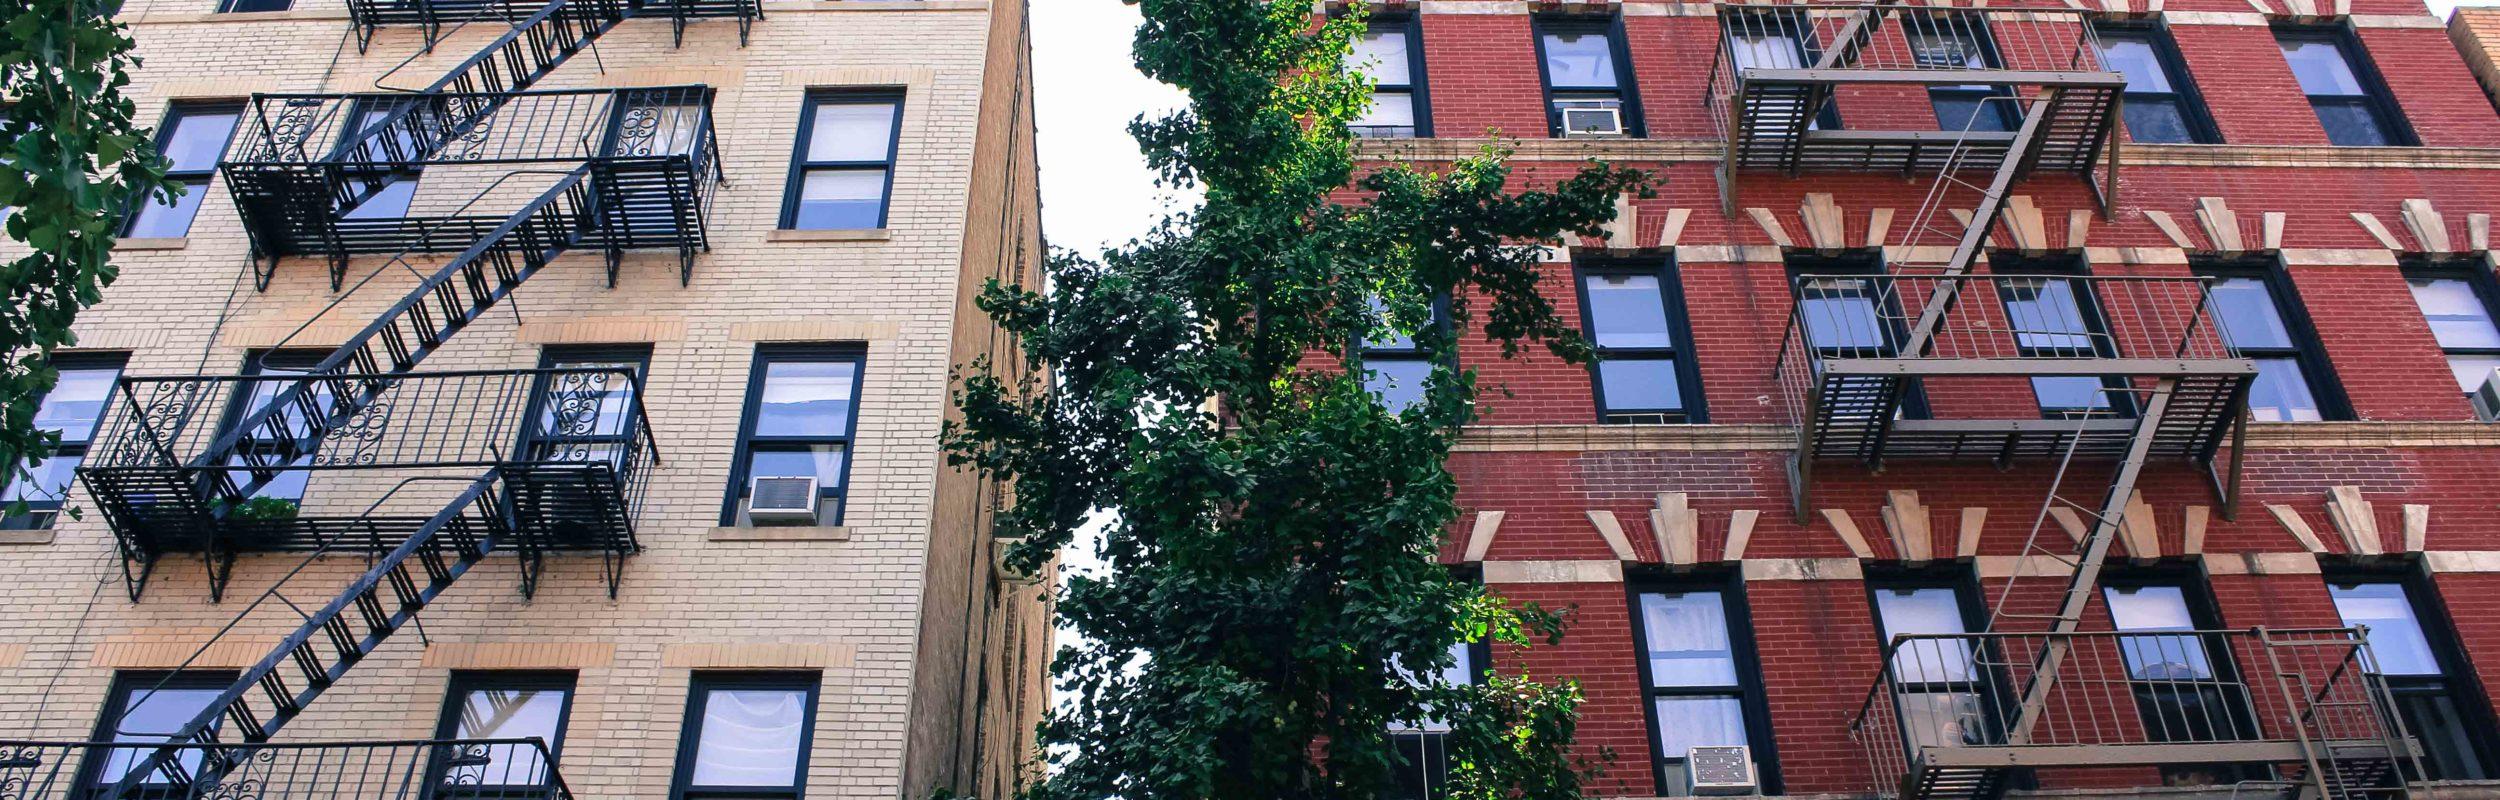 New York City #4 : 10 kms à pieds, ça use, ça use… (Greenwich Village, Lower Manhattan, China Town, Little Italy)